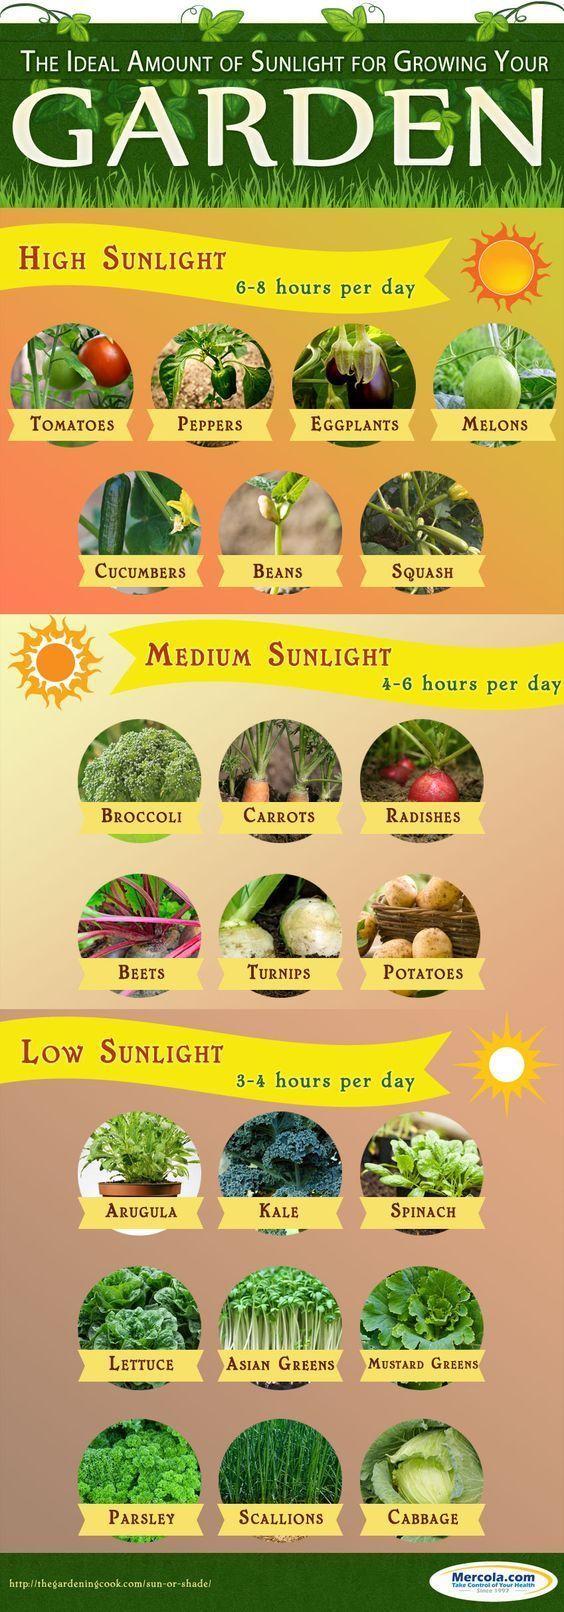 d298d2d4f900578abab9abb0ba5db018 - Expert Gardener Plant Food How To Use